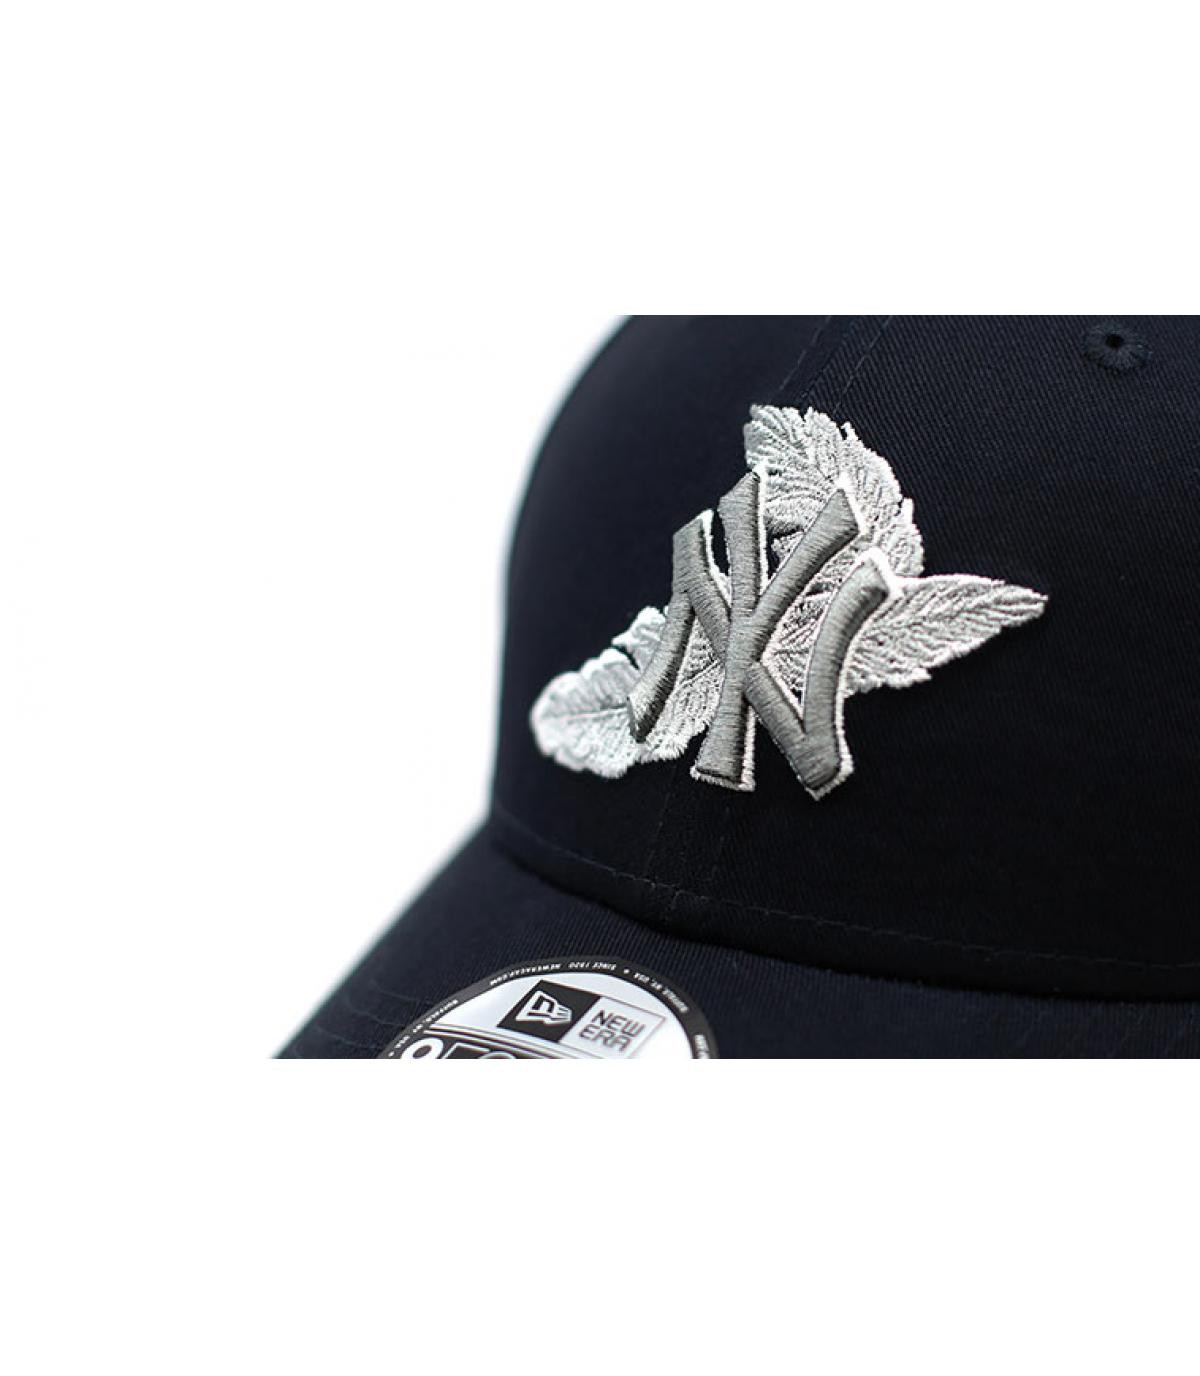 Details Cap MLB Light Weight NY 9Forty navy gray - Abbildung 3